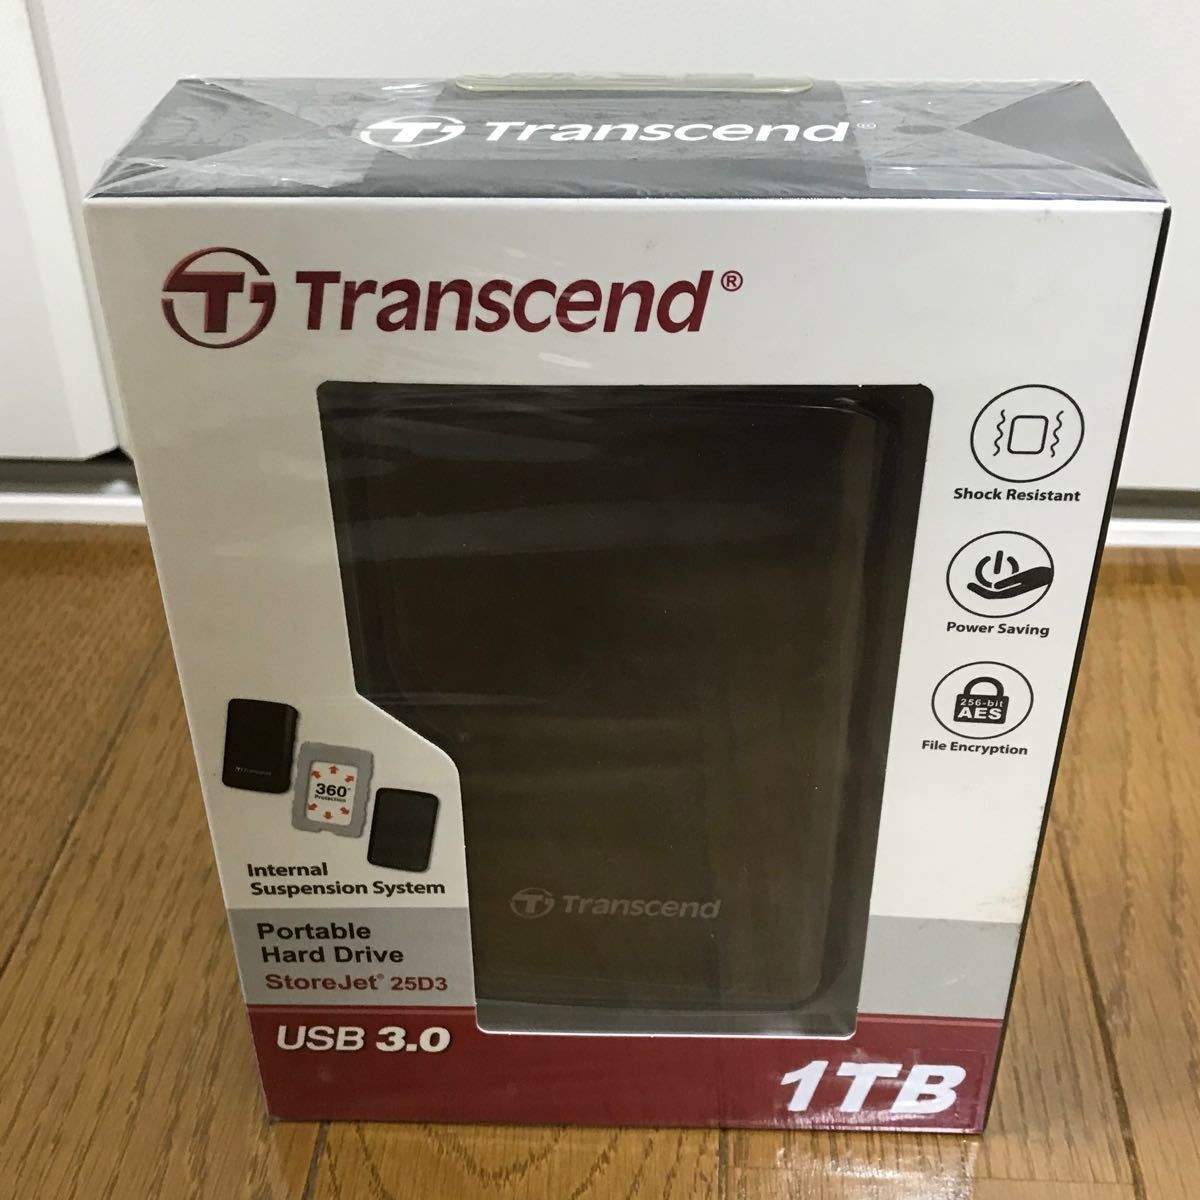 Transcend 外付けハードディスク 1TB TS1TSJ25D3 新品未開封!